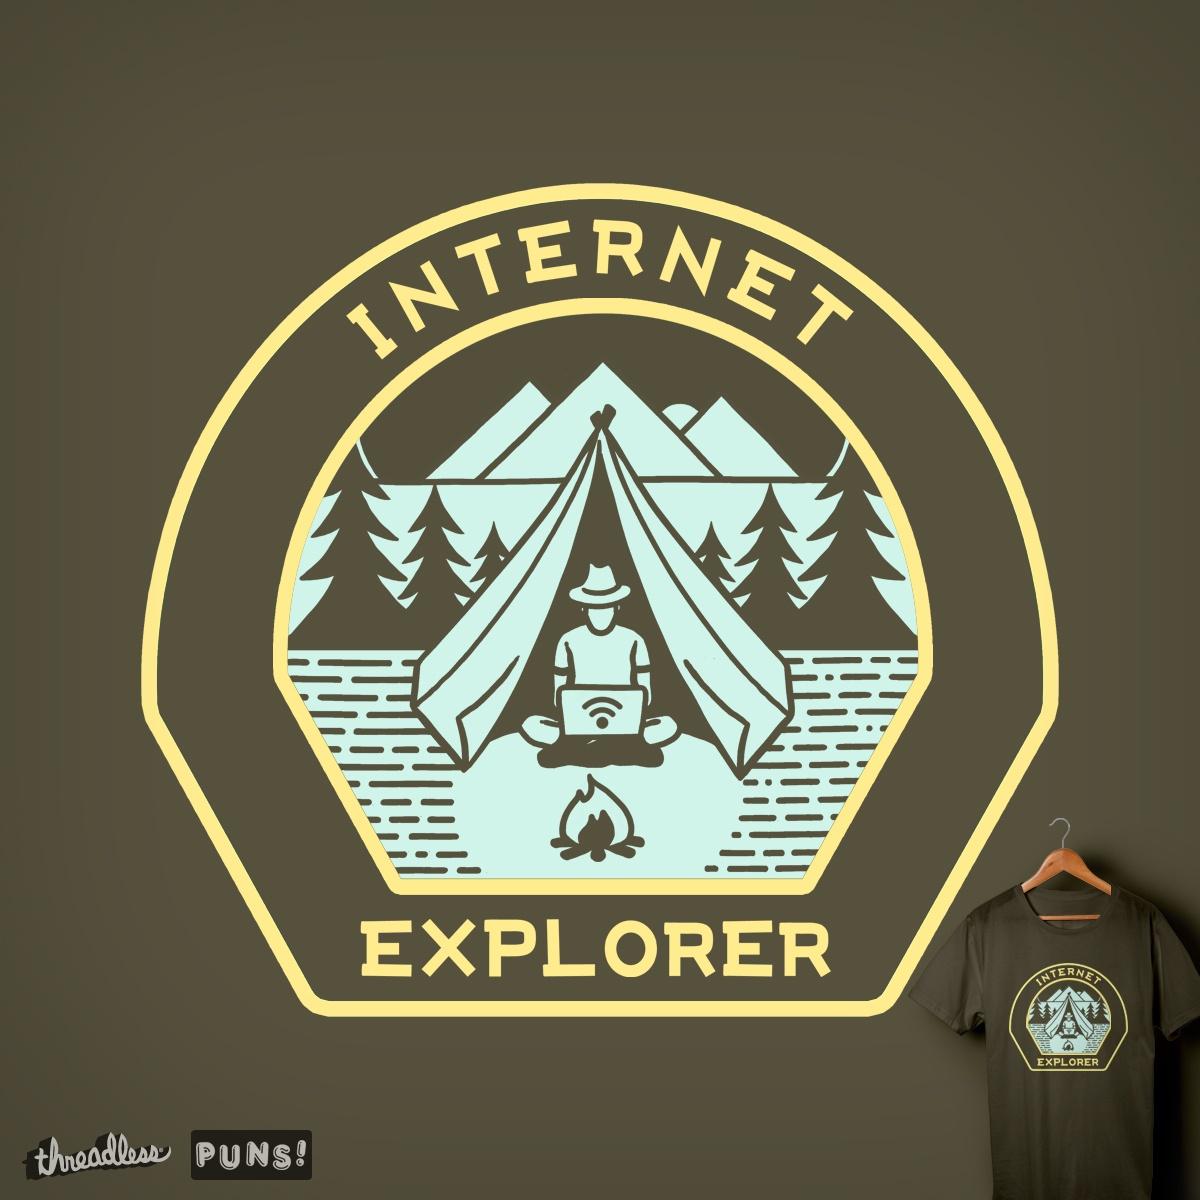 INTERNET EXPLORER by yortsiraulo on Threadless